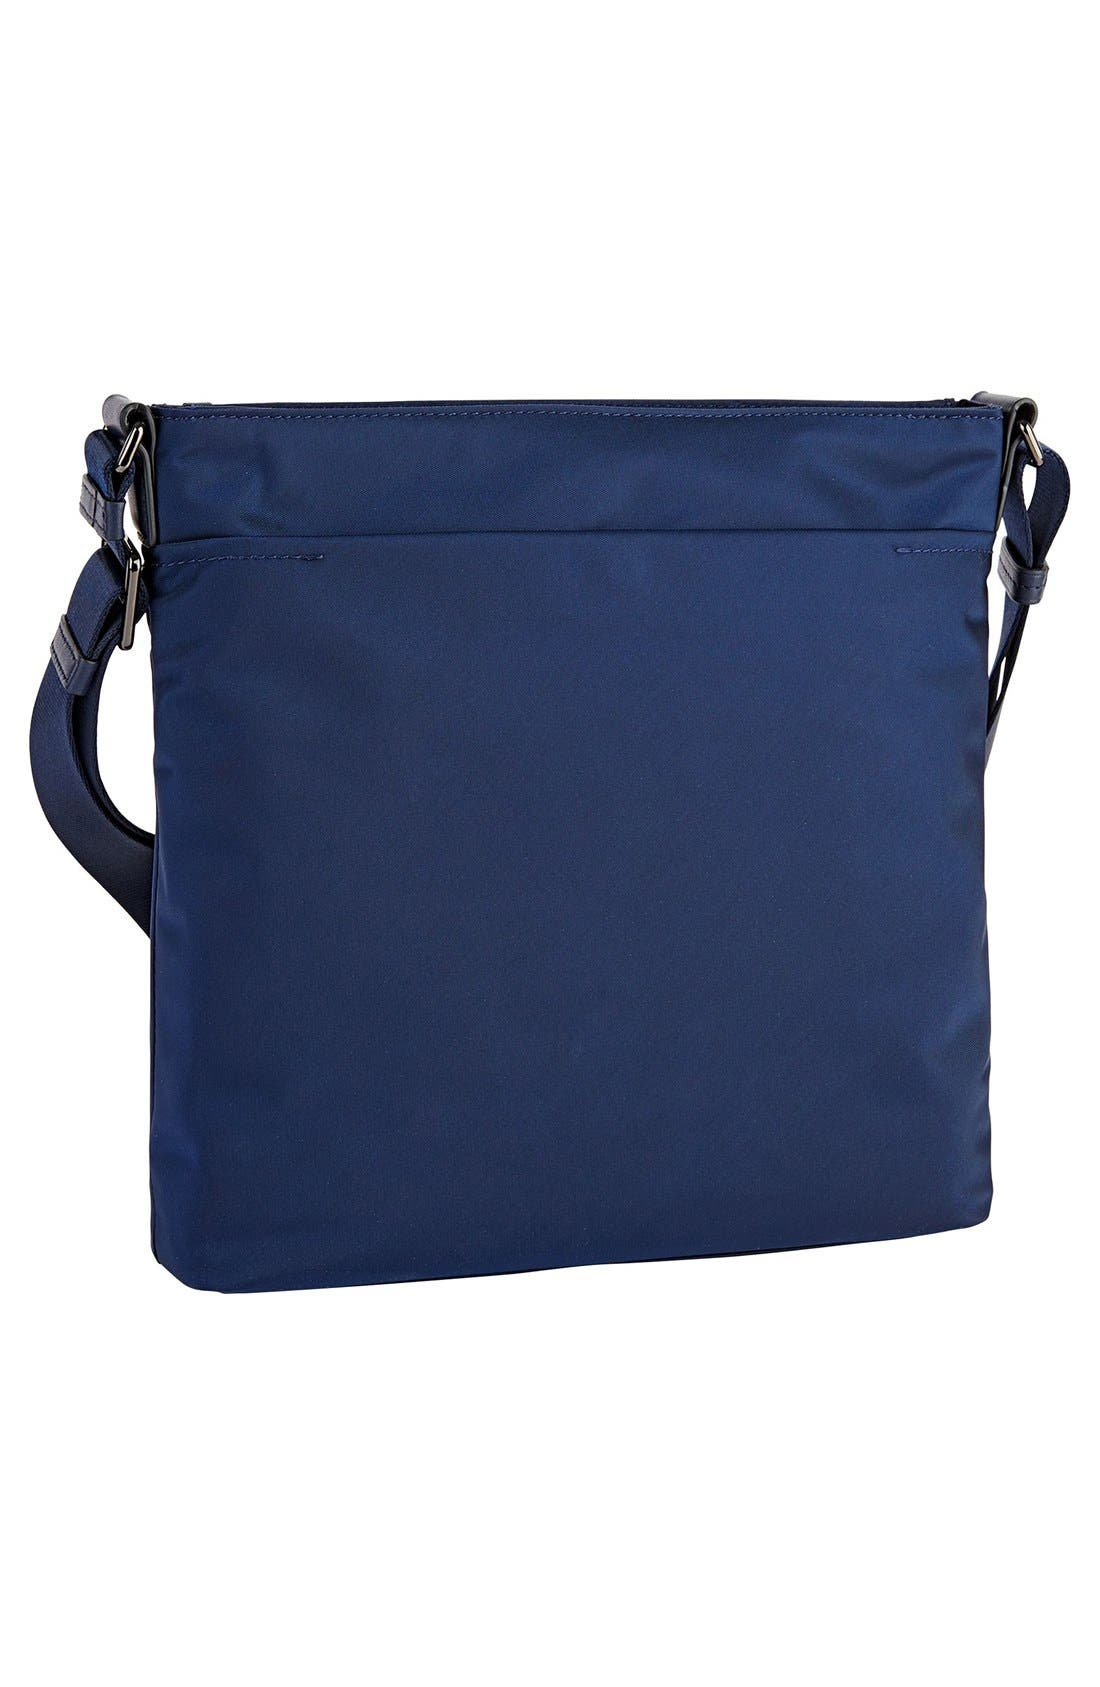 Voyageur - Capri Nylon Crossbody Bag,                             Alternate thumbnail 41, color,